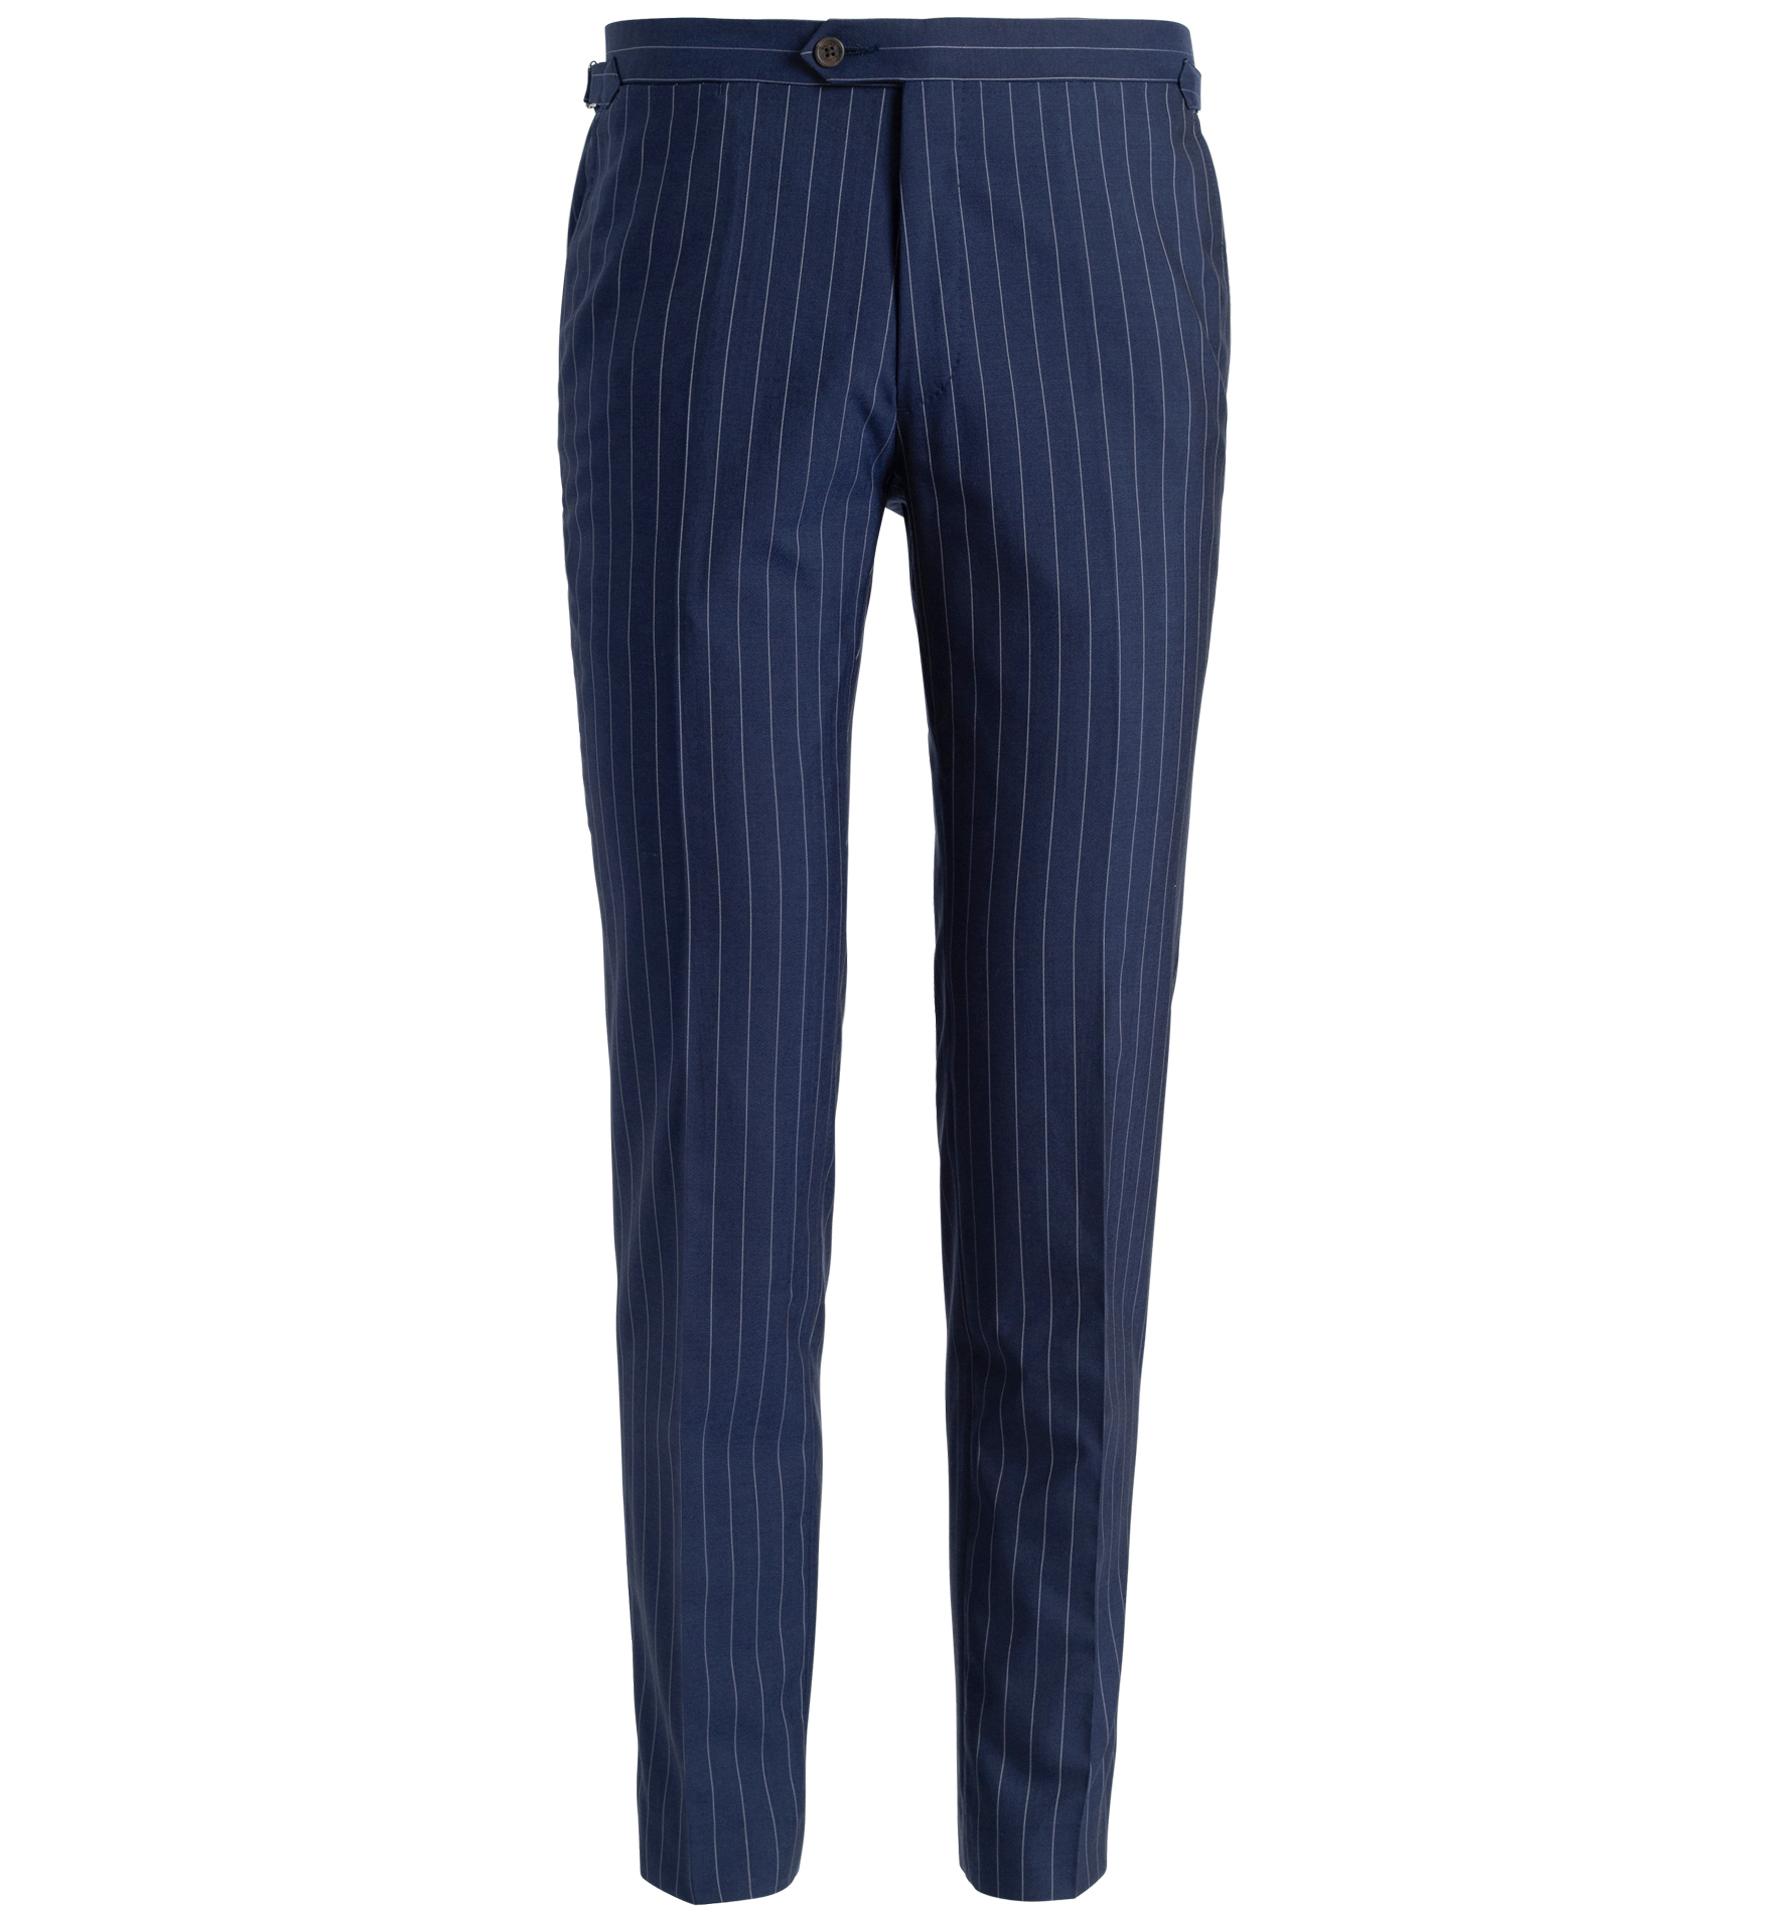 Zoom Image of Allen Navy S130s Pinstripe Tropical Wool Trouser